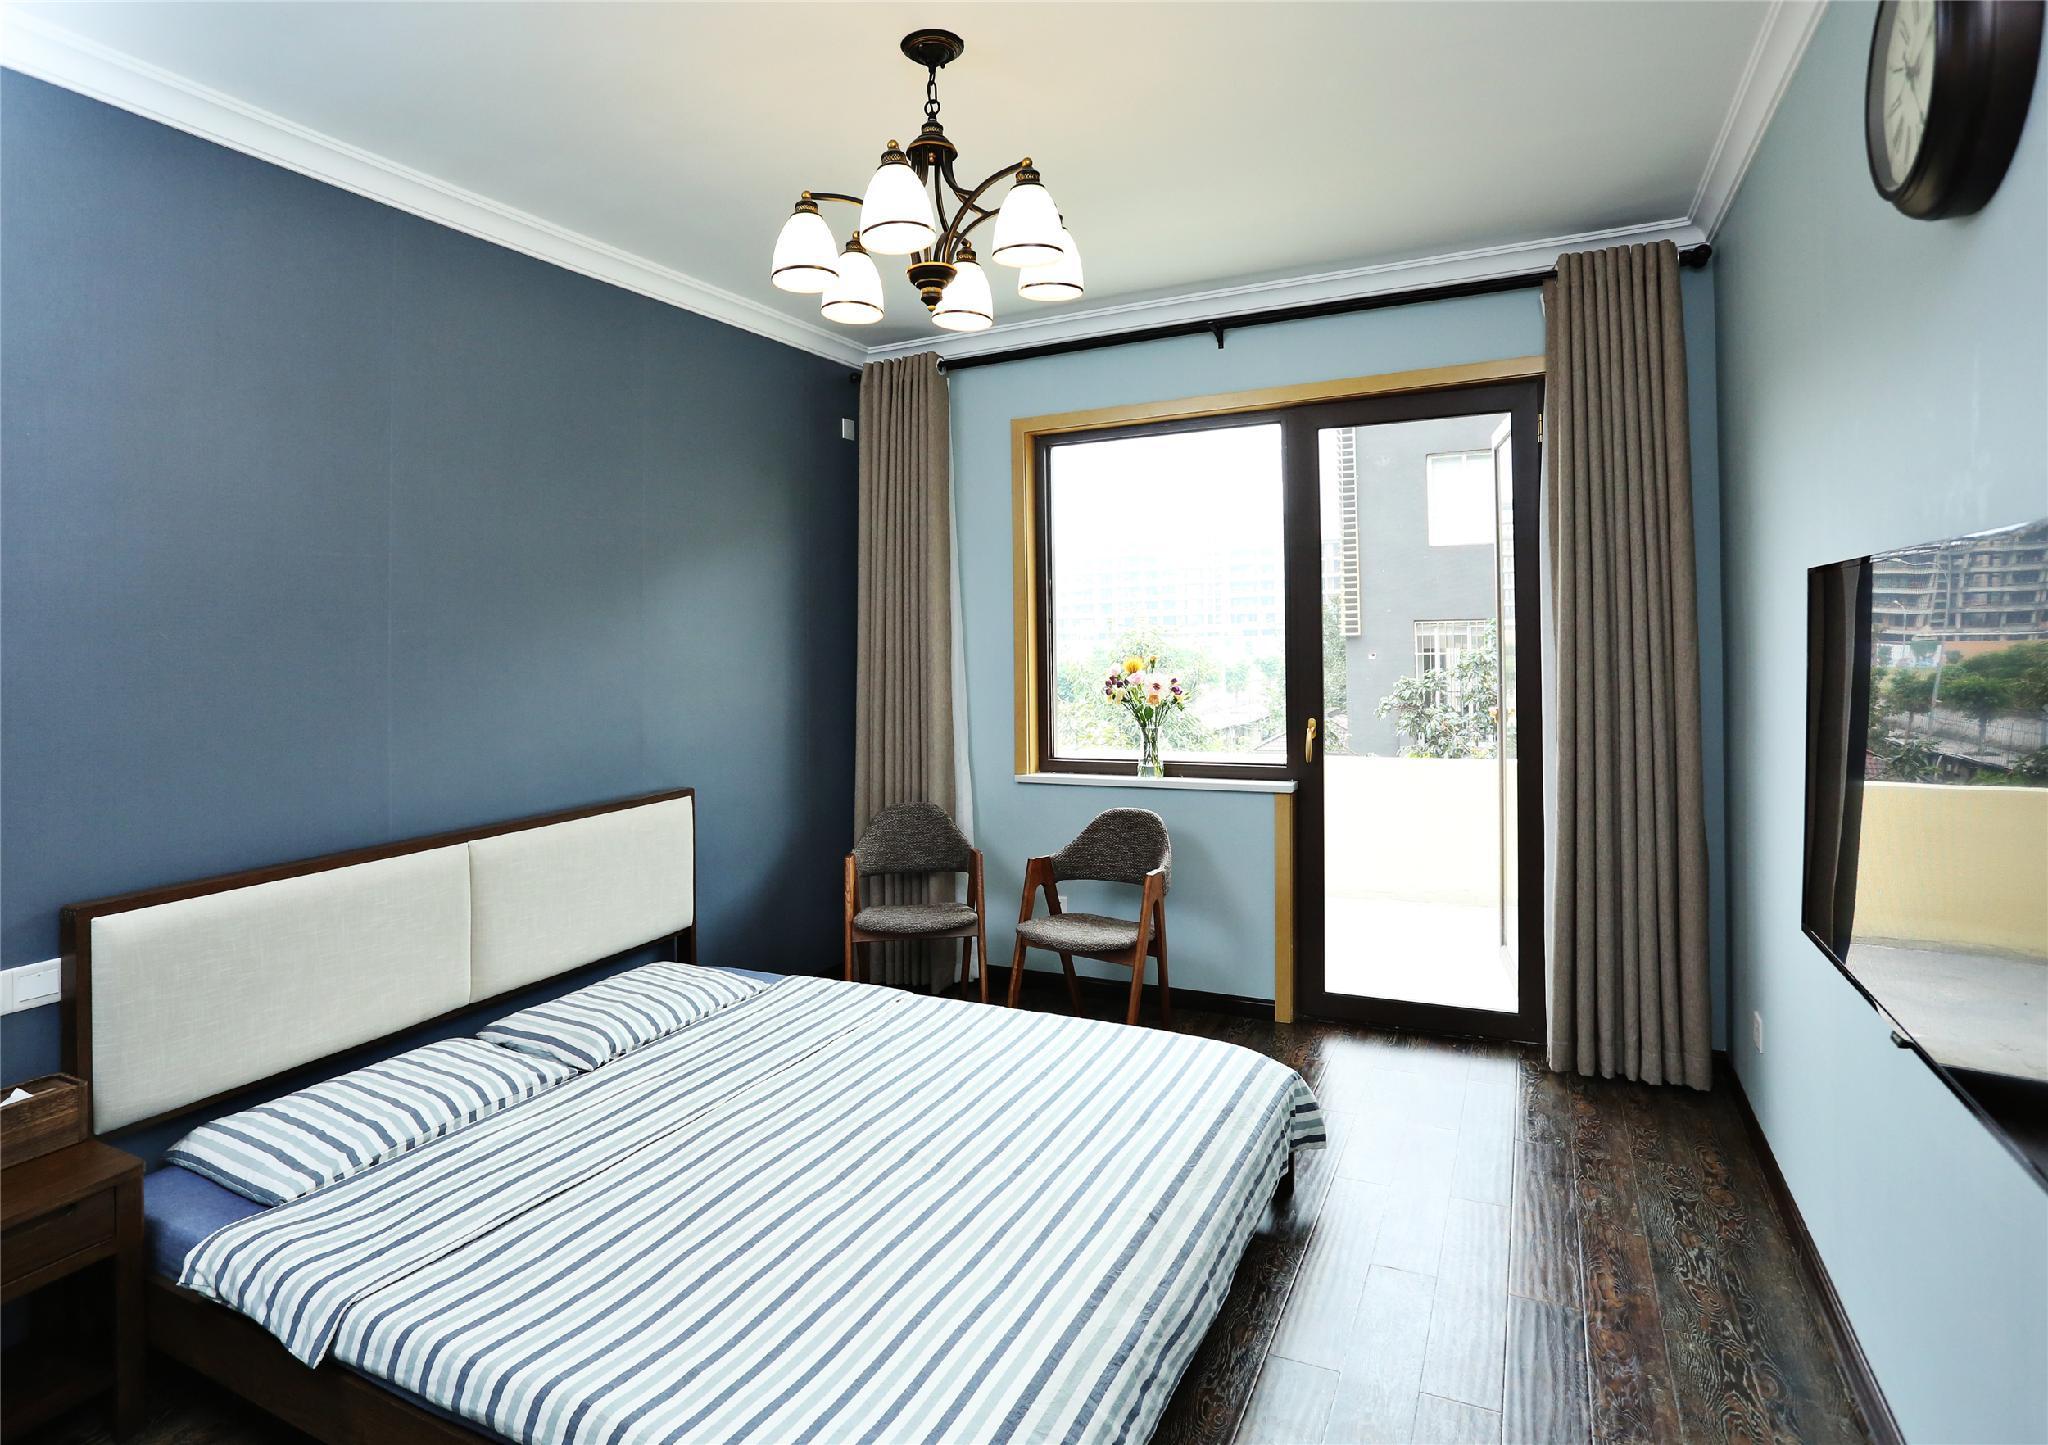 2 Bedroom Sunny Family Studio G With Floor Heating